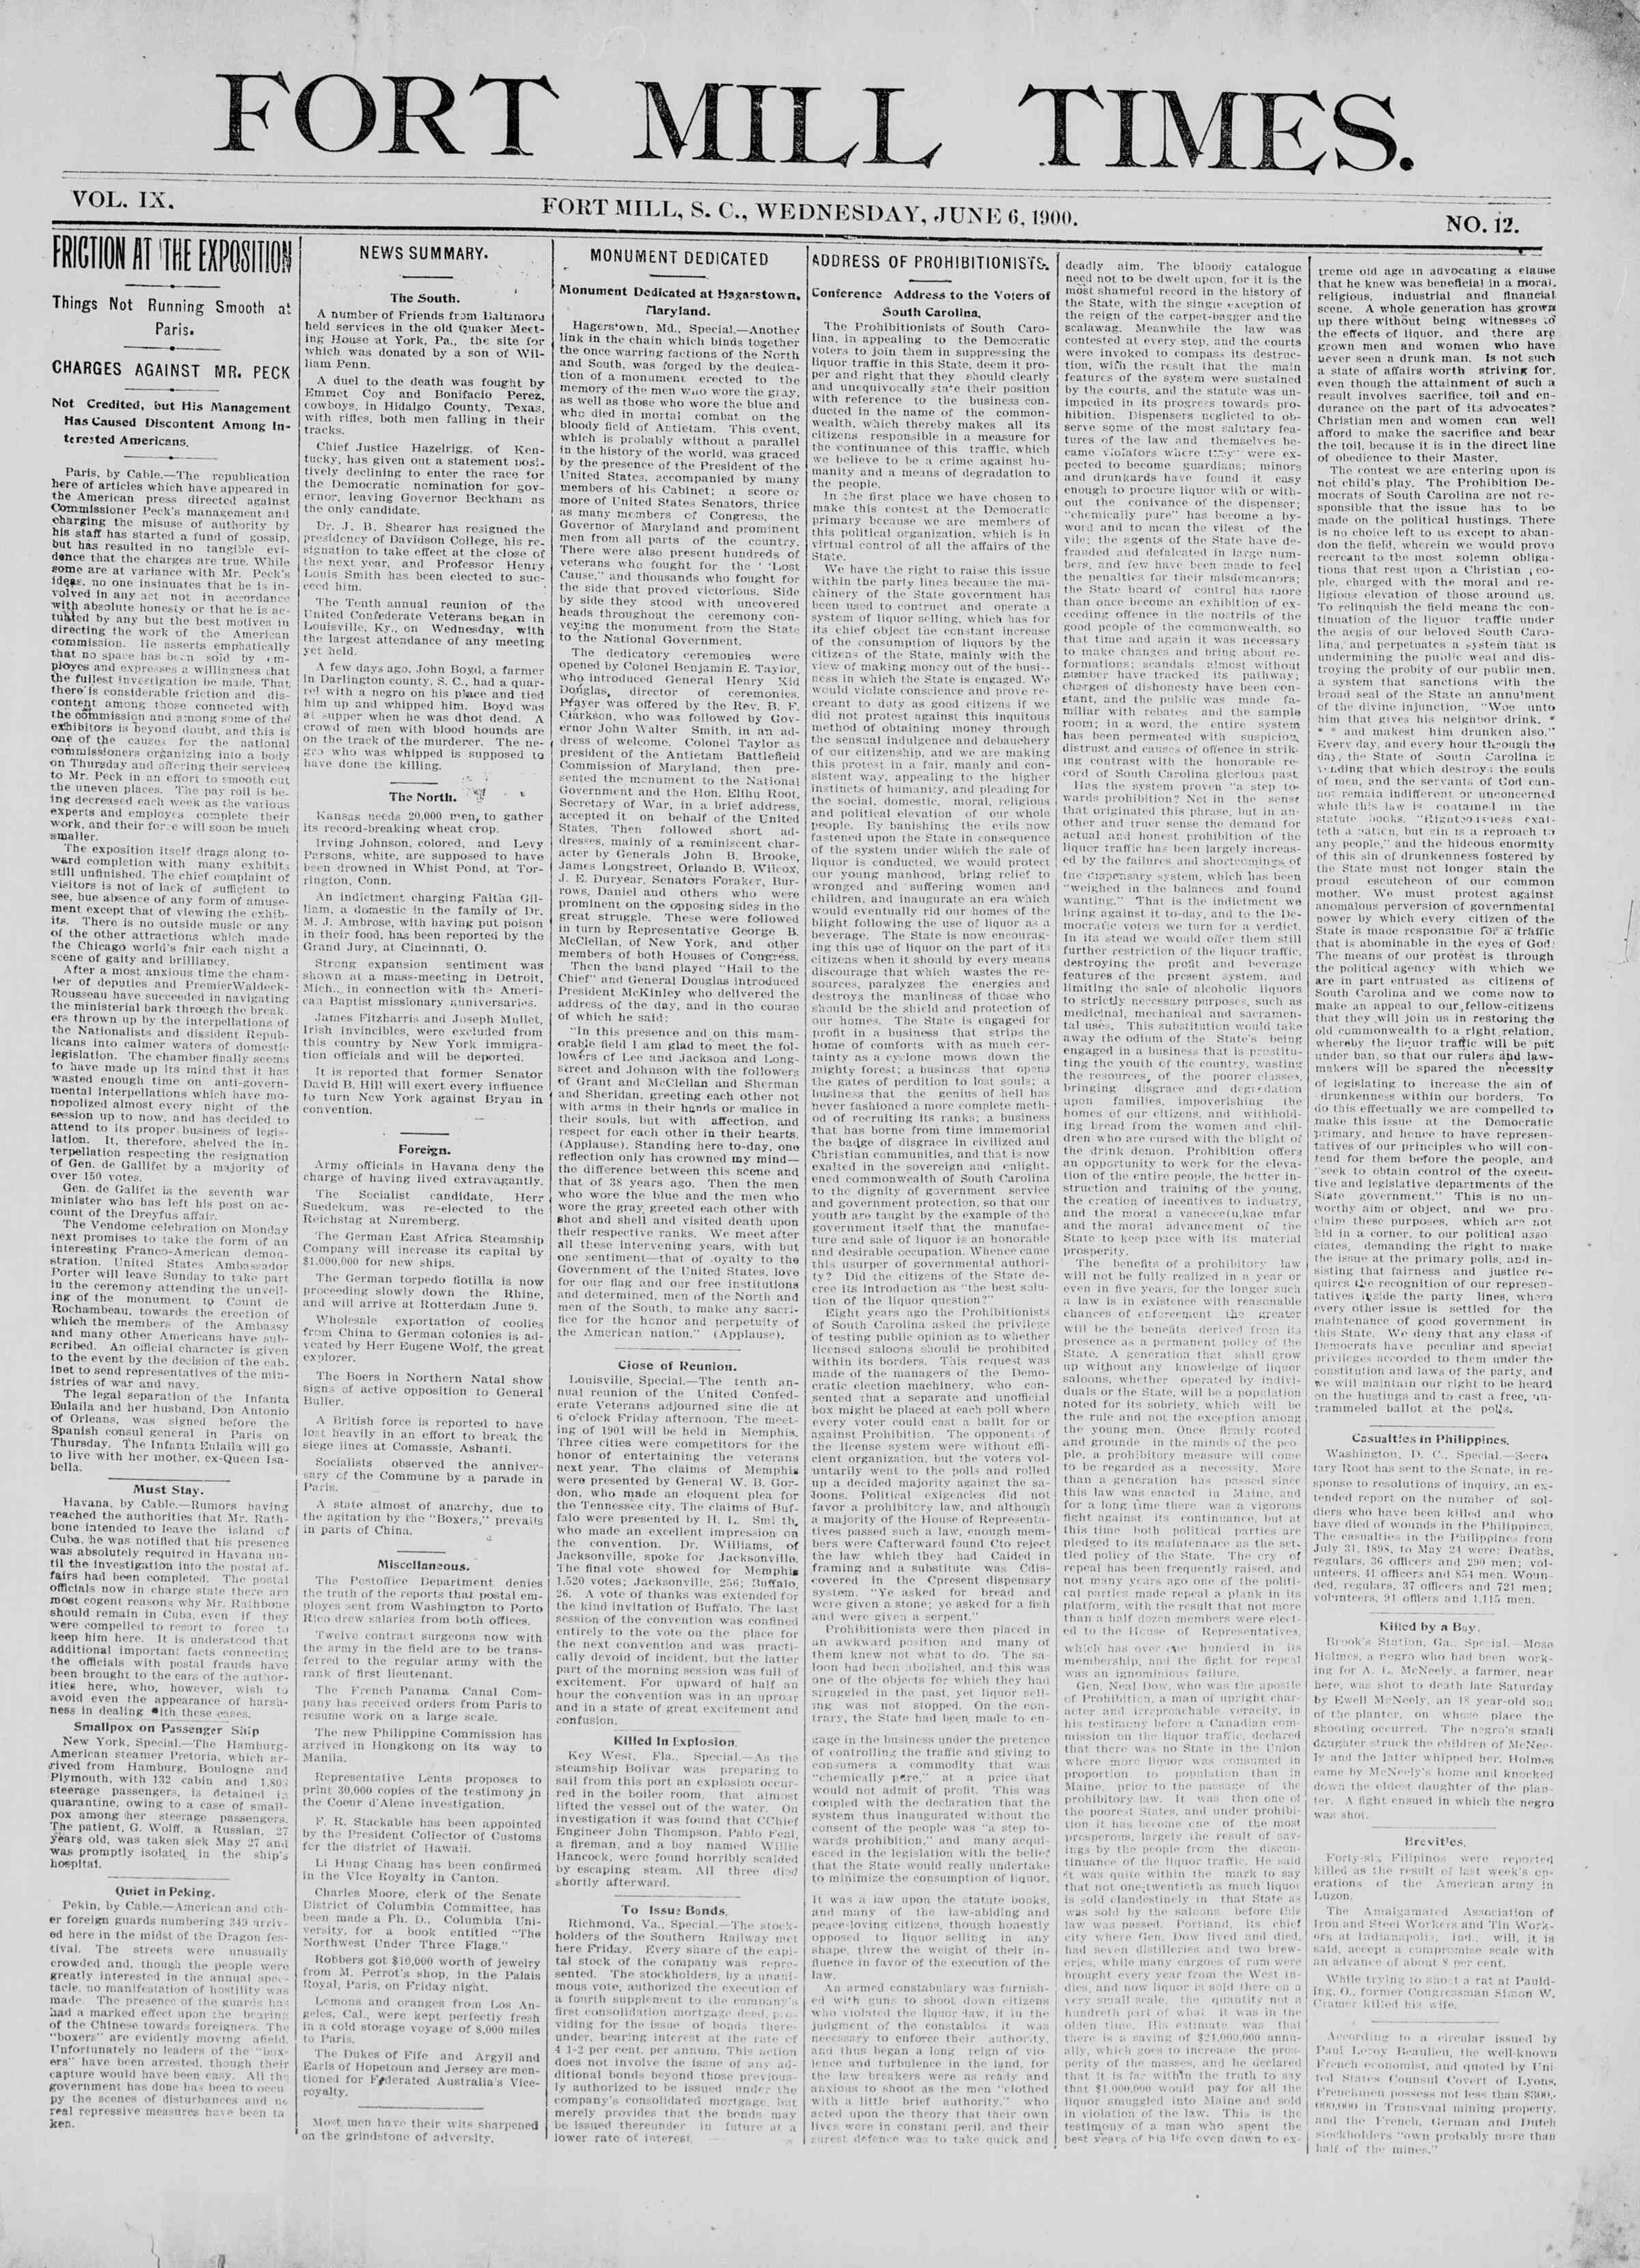 June 6, 1900 Tarihli Fort Mill Times Dergisi Sayfa 1